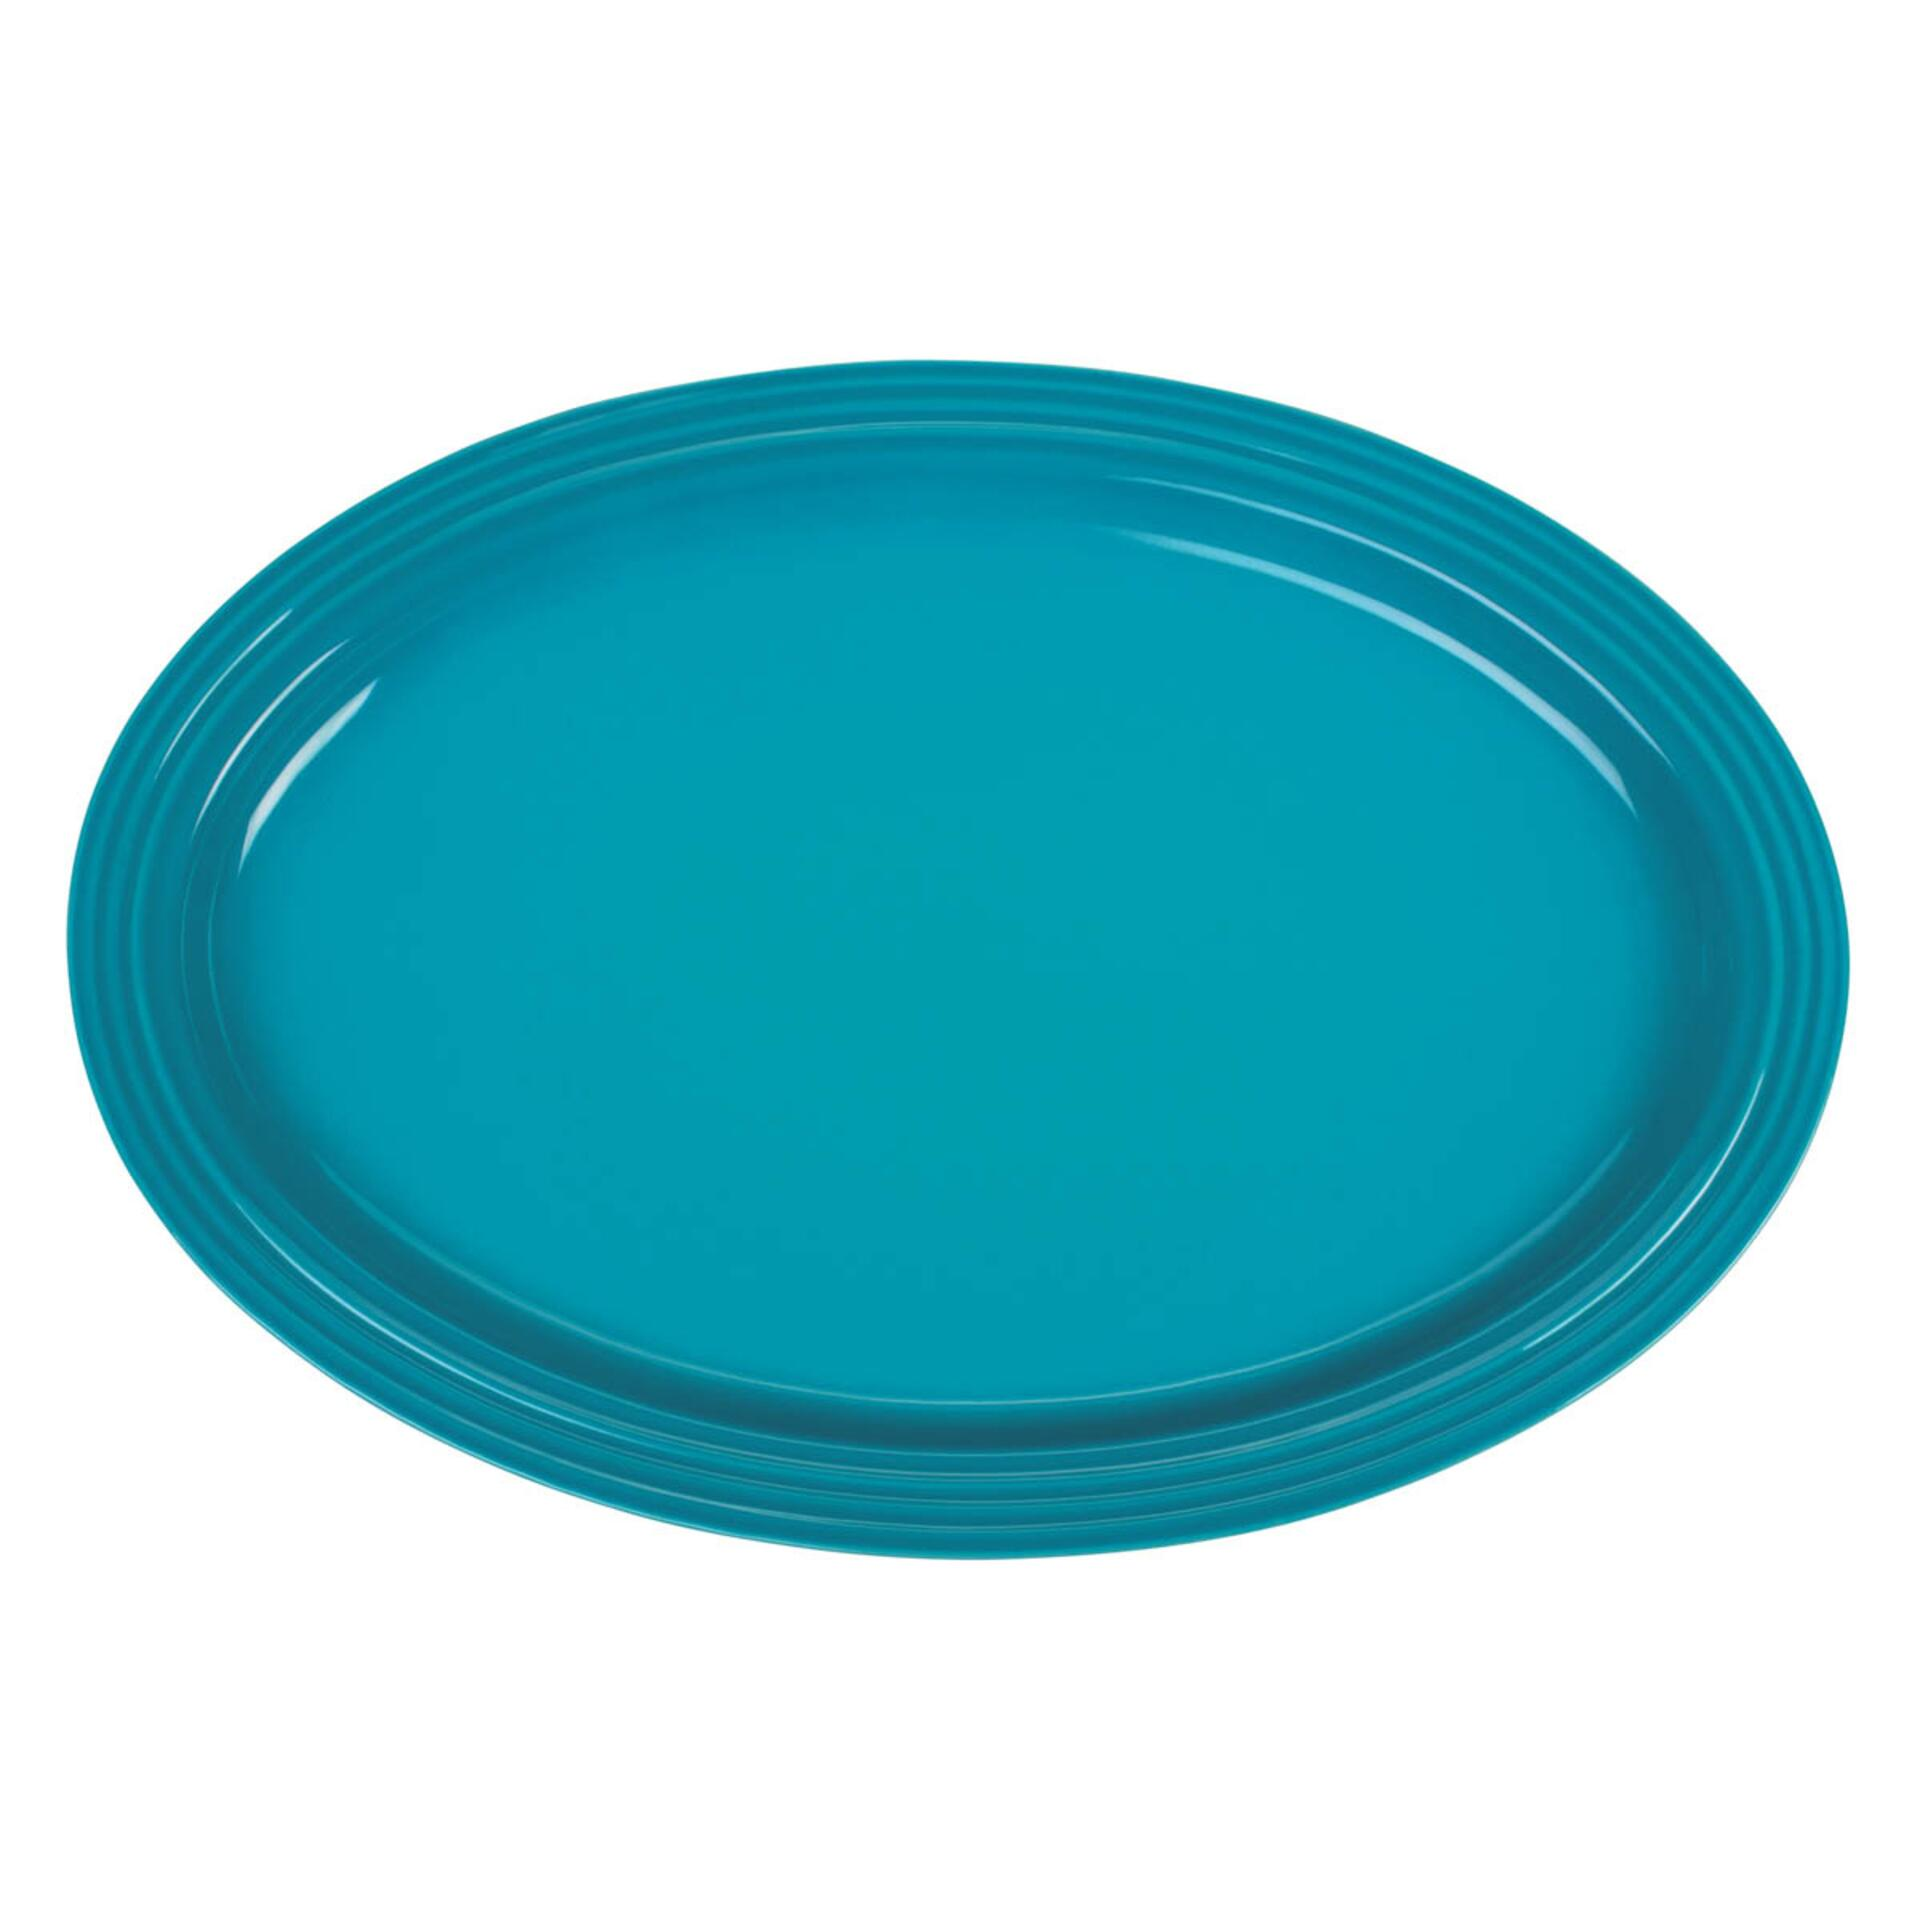 Le Creuset Servierplatte oval 46 cm Karibik